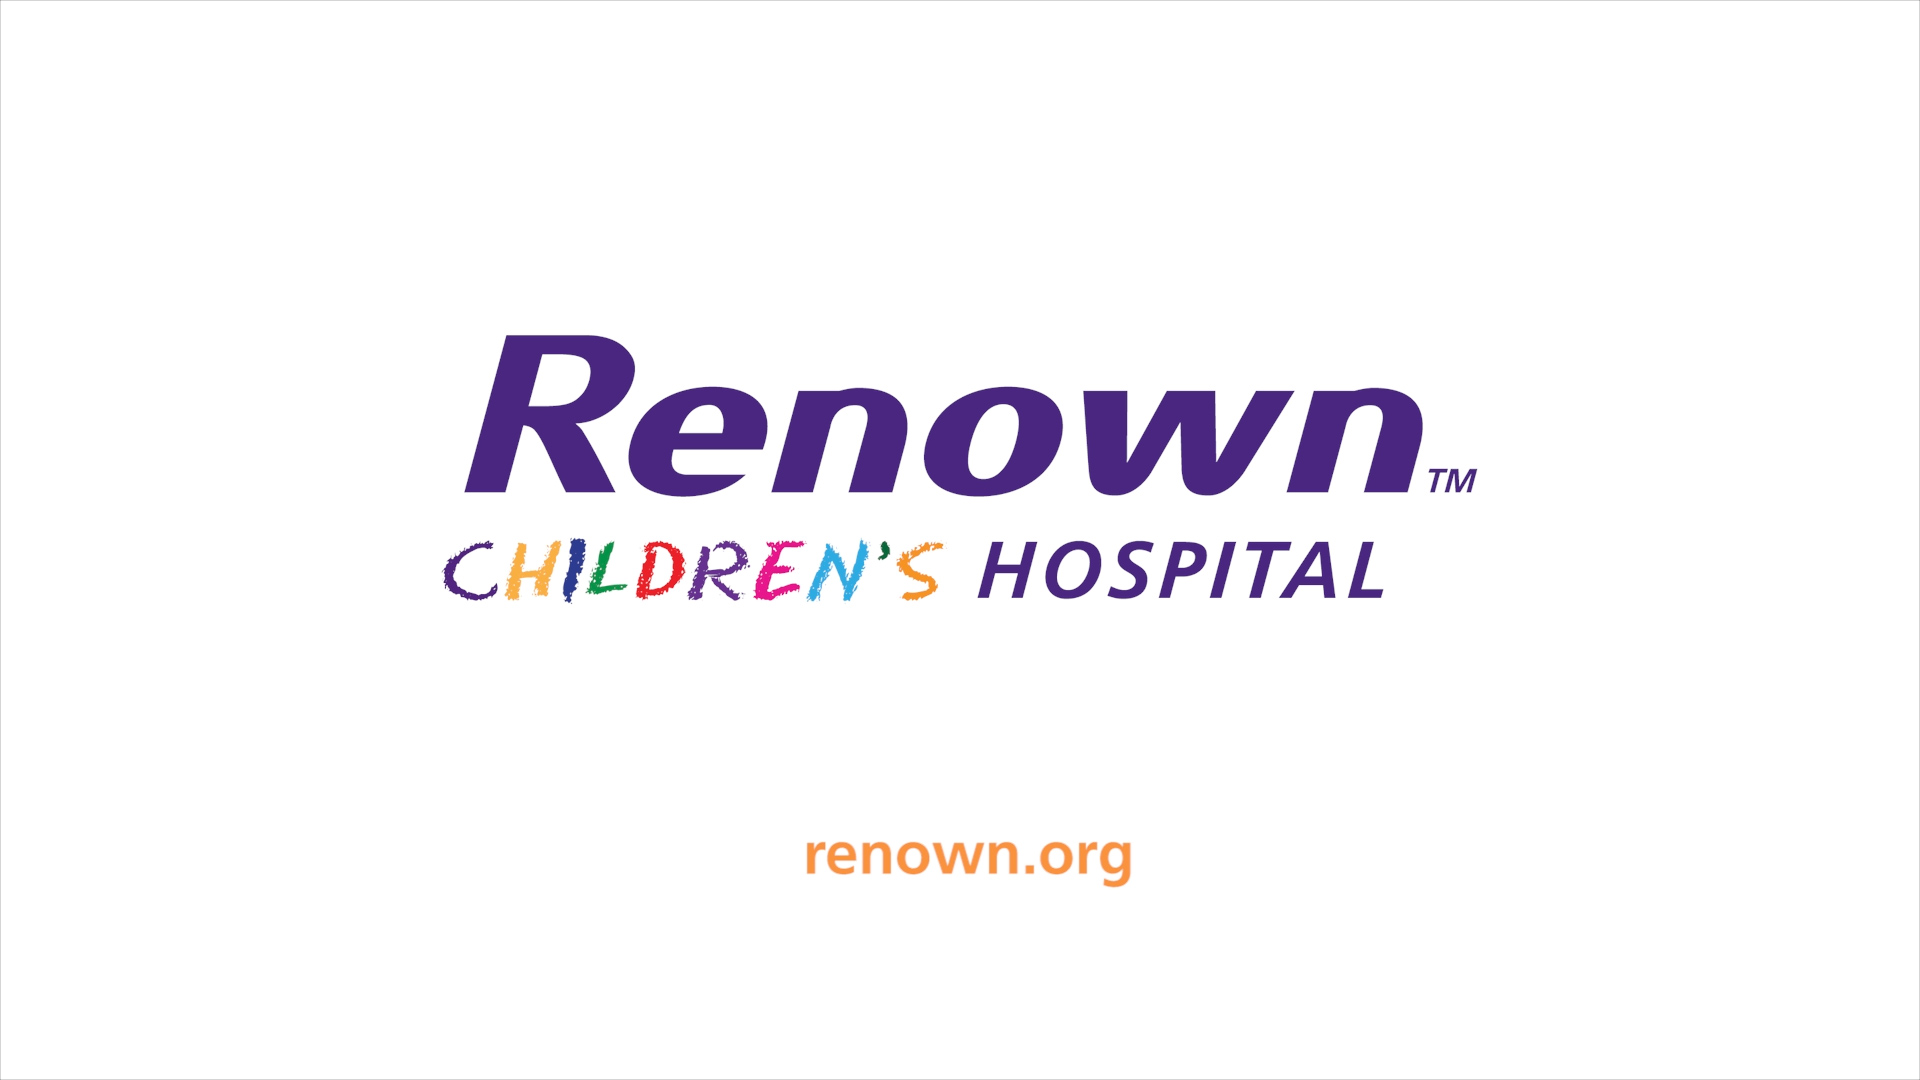 RENOWNChildrens Hospital_Still